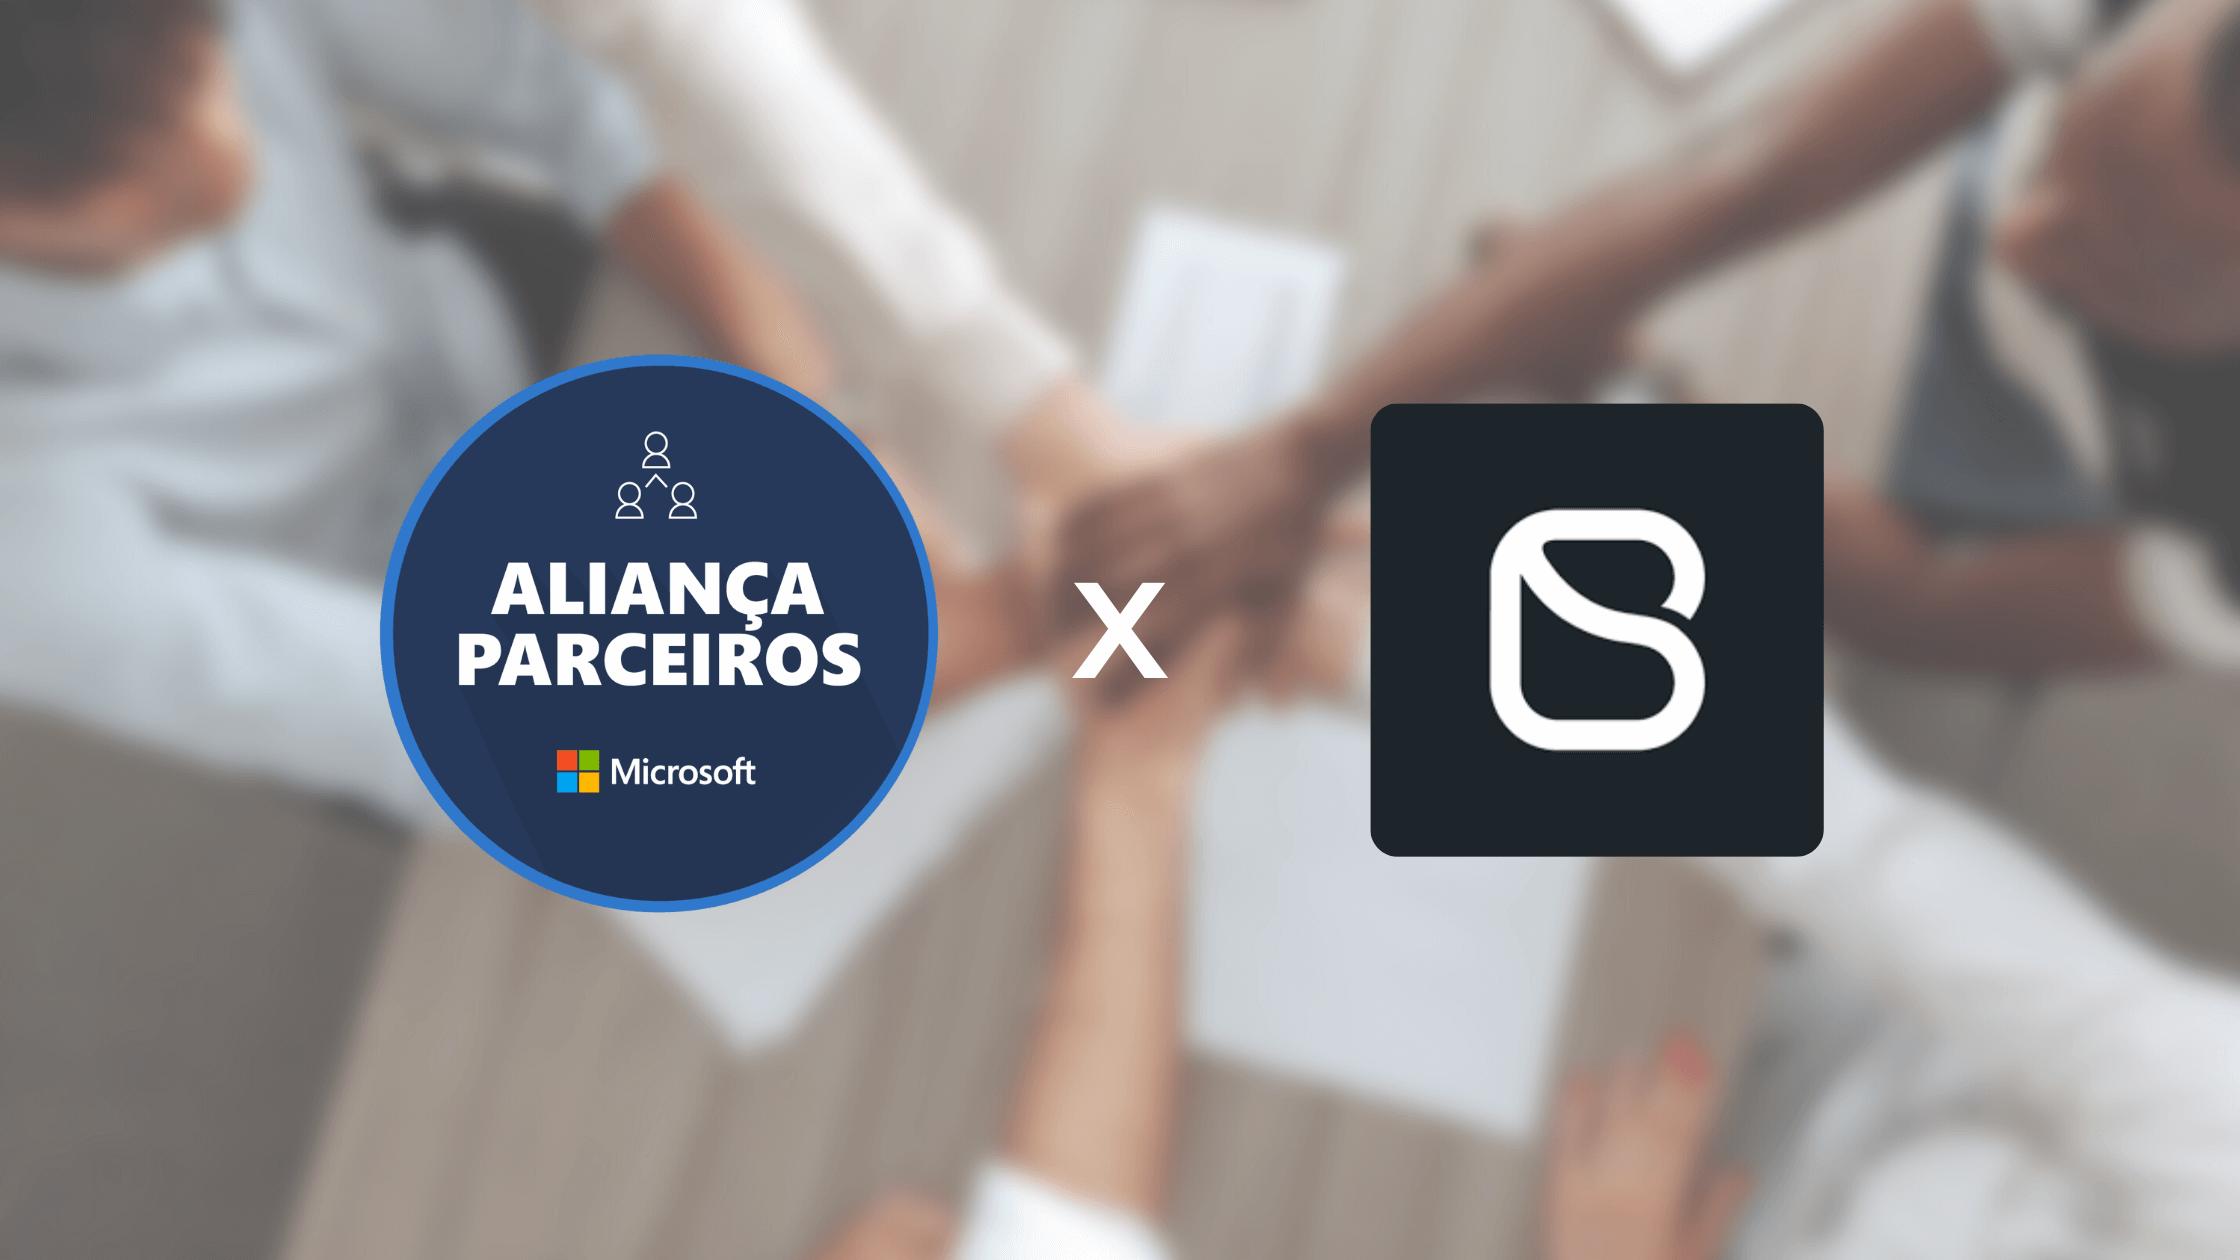 bindtuning-joins-the-microsoft-partner-pledge